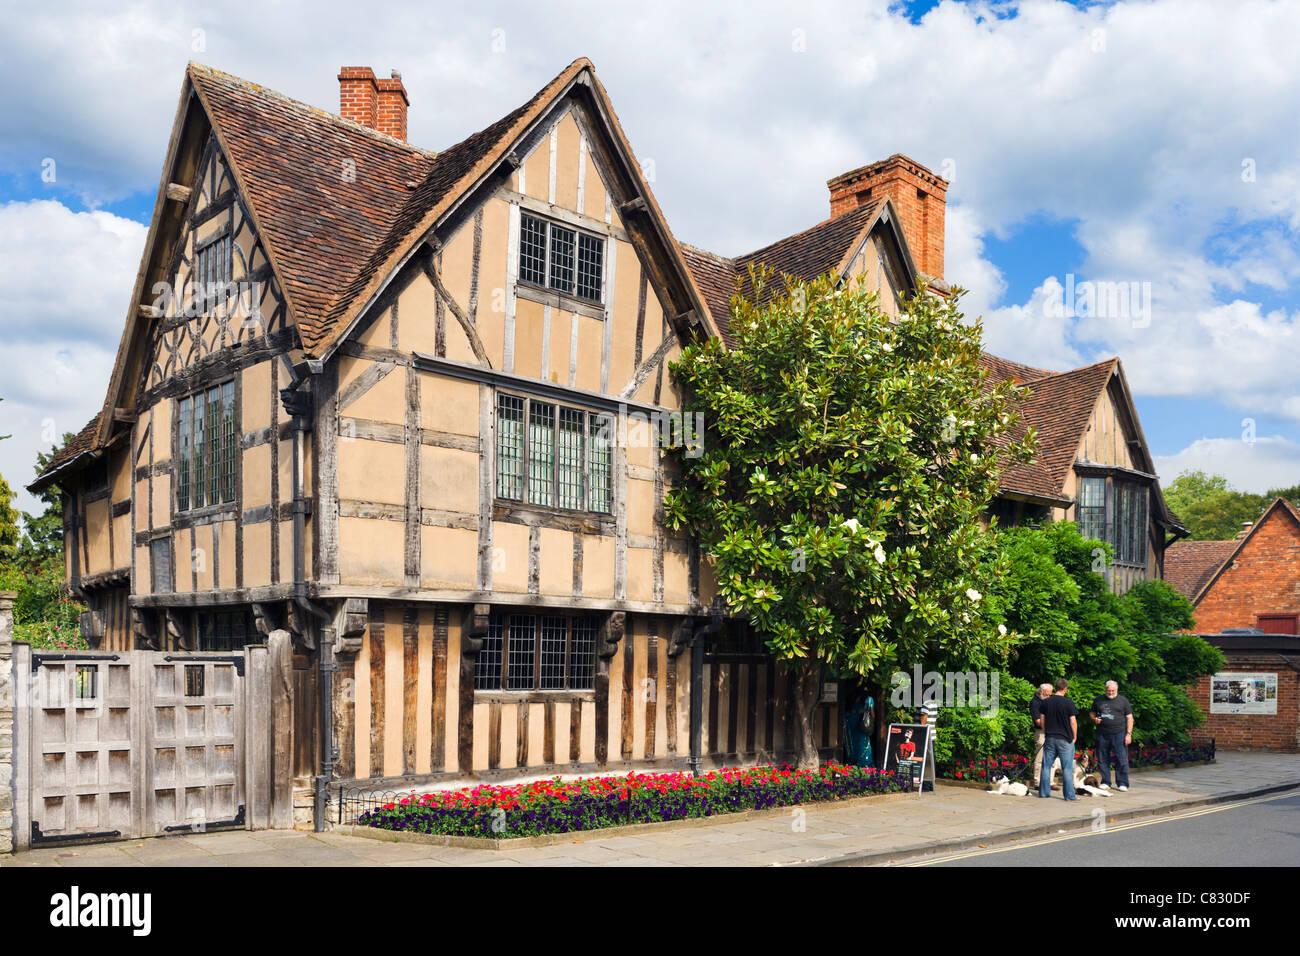 Hall's Croft (home of Shakespeare's daughter, Susanna Hall), Stratford-upon-Avon, Warwickshire, England, - Stock Image